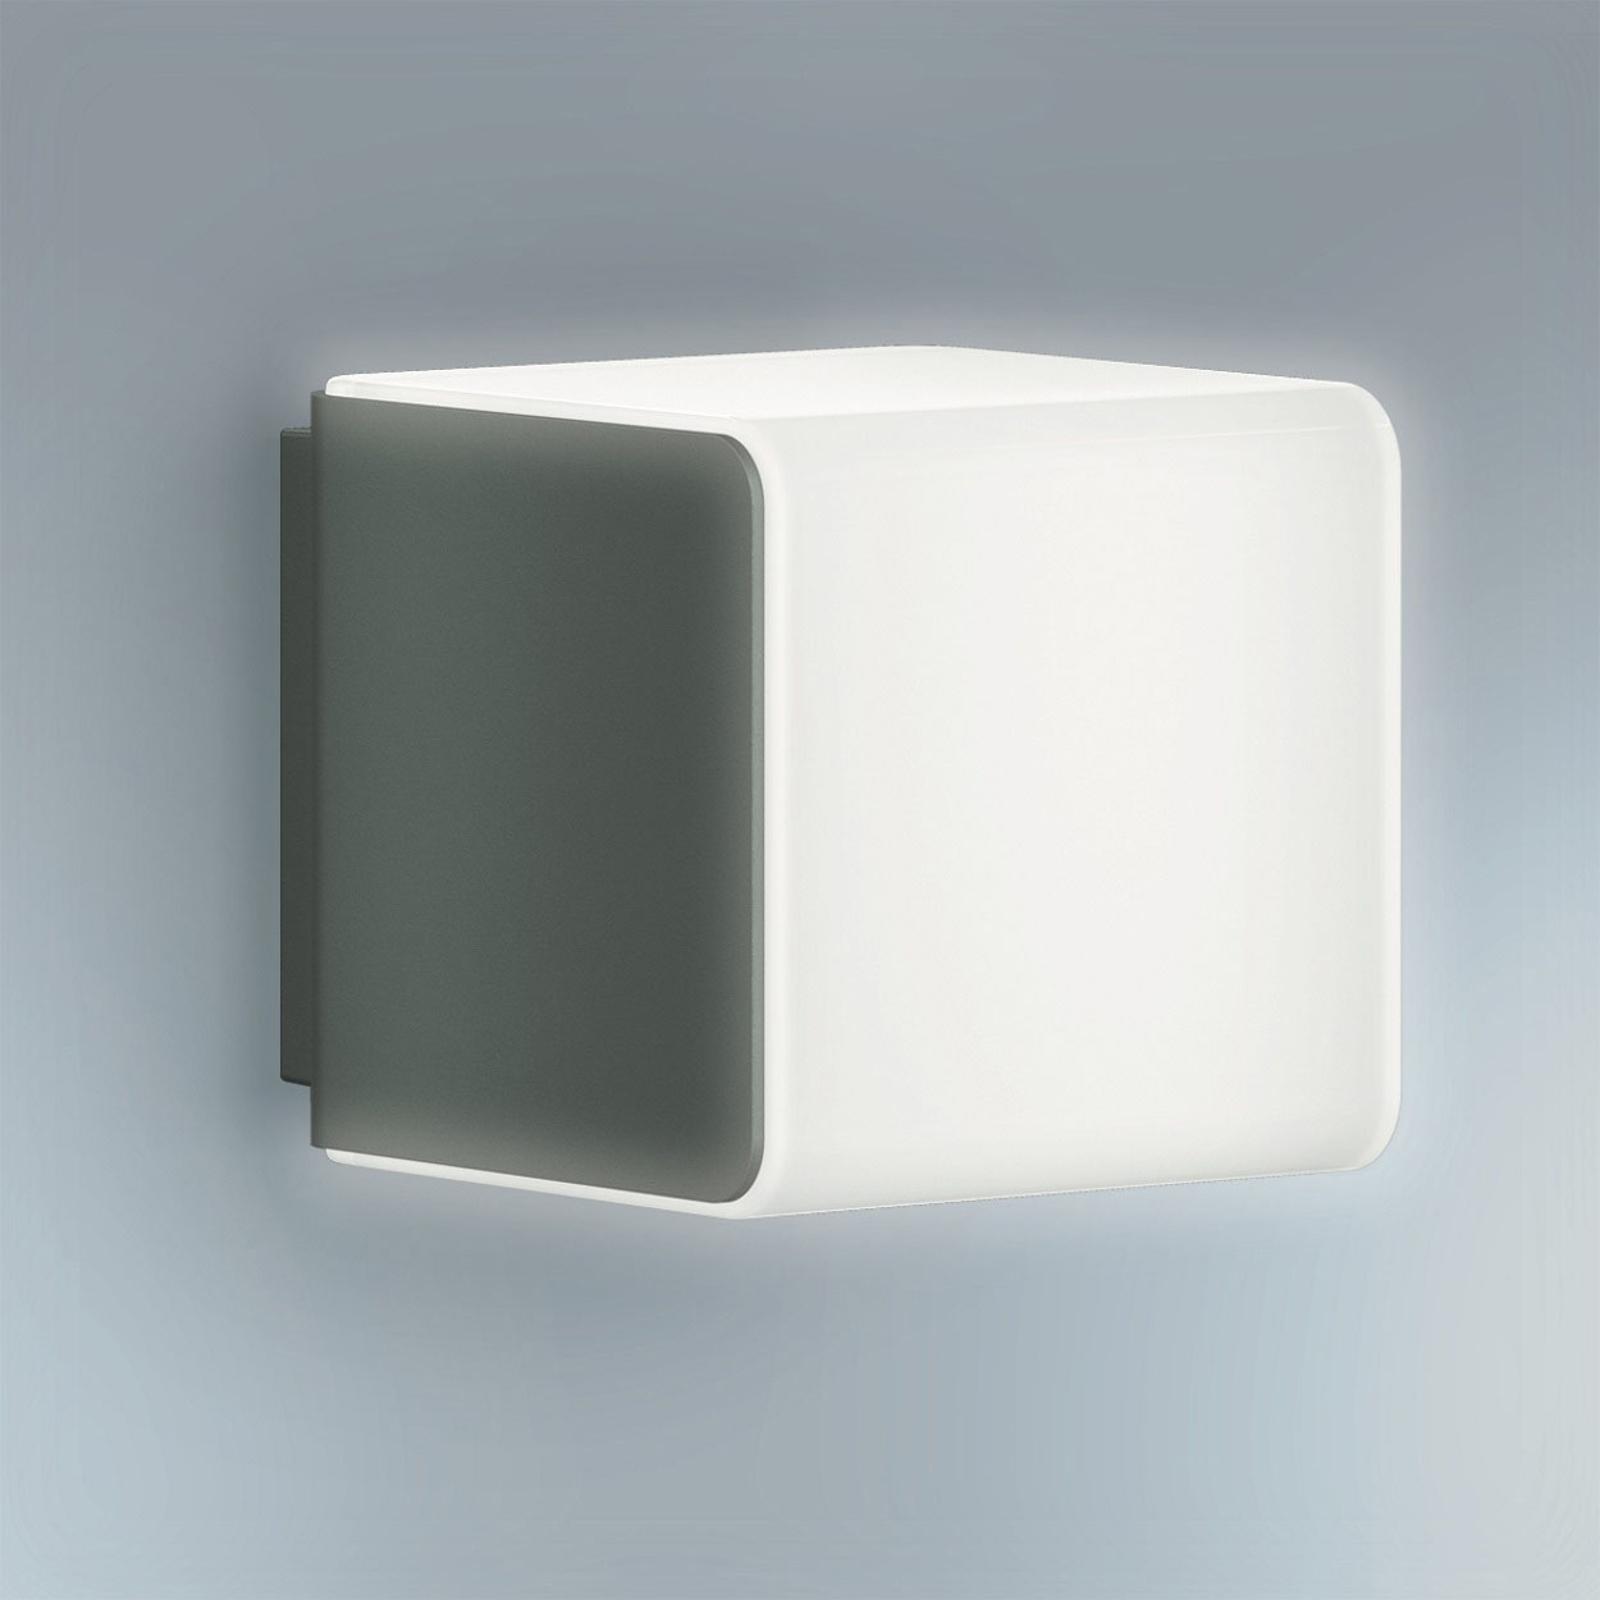 STEINEL L 830 iHF buitenwandlamp, antraciet